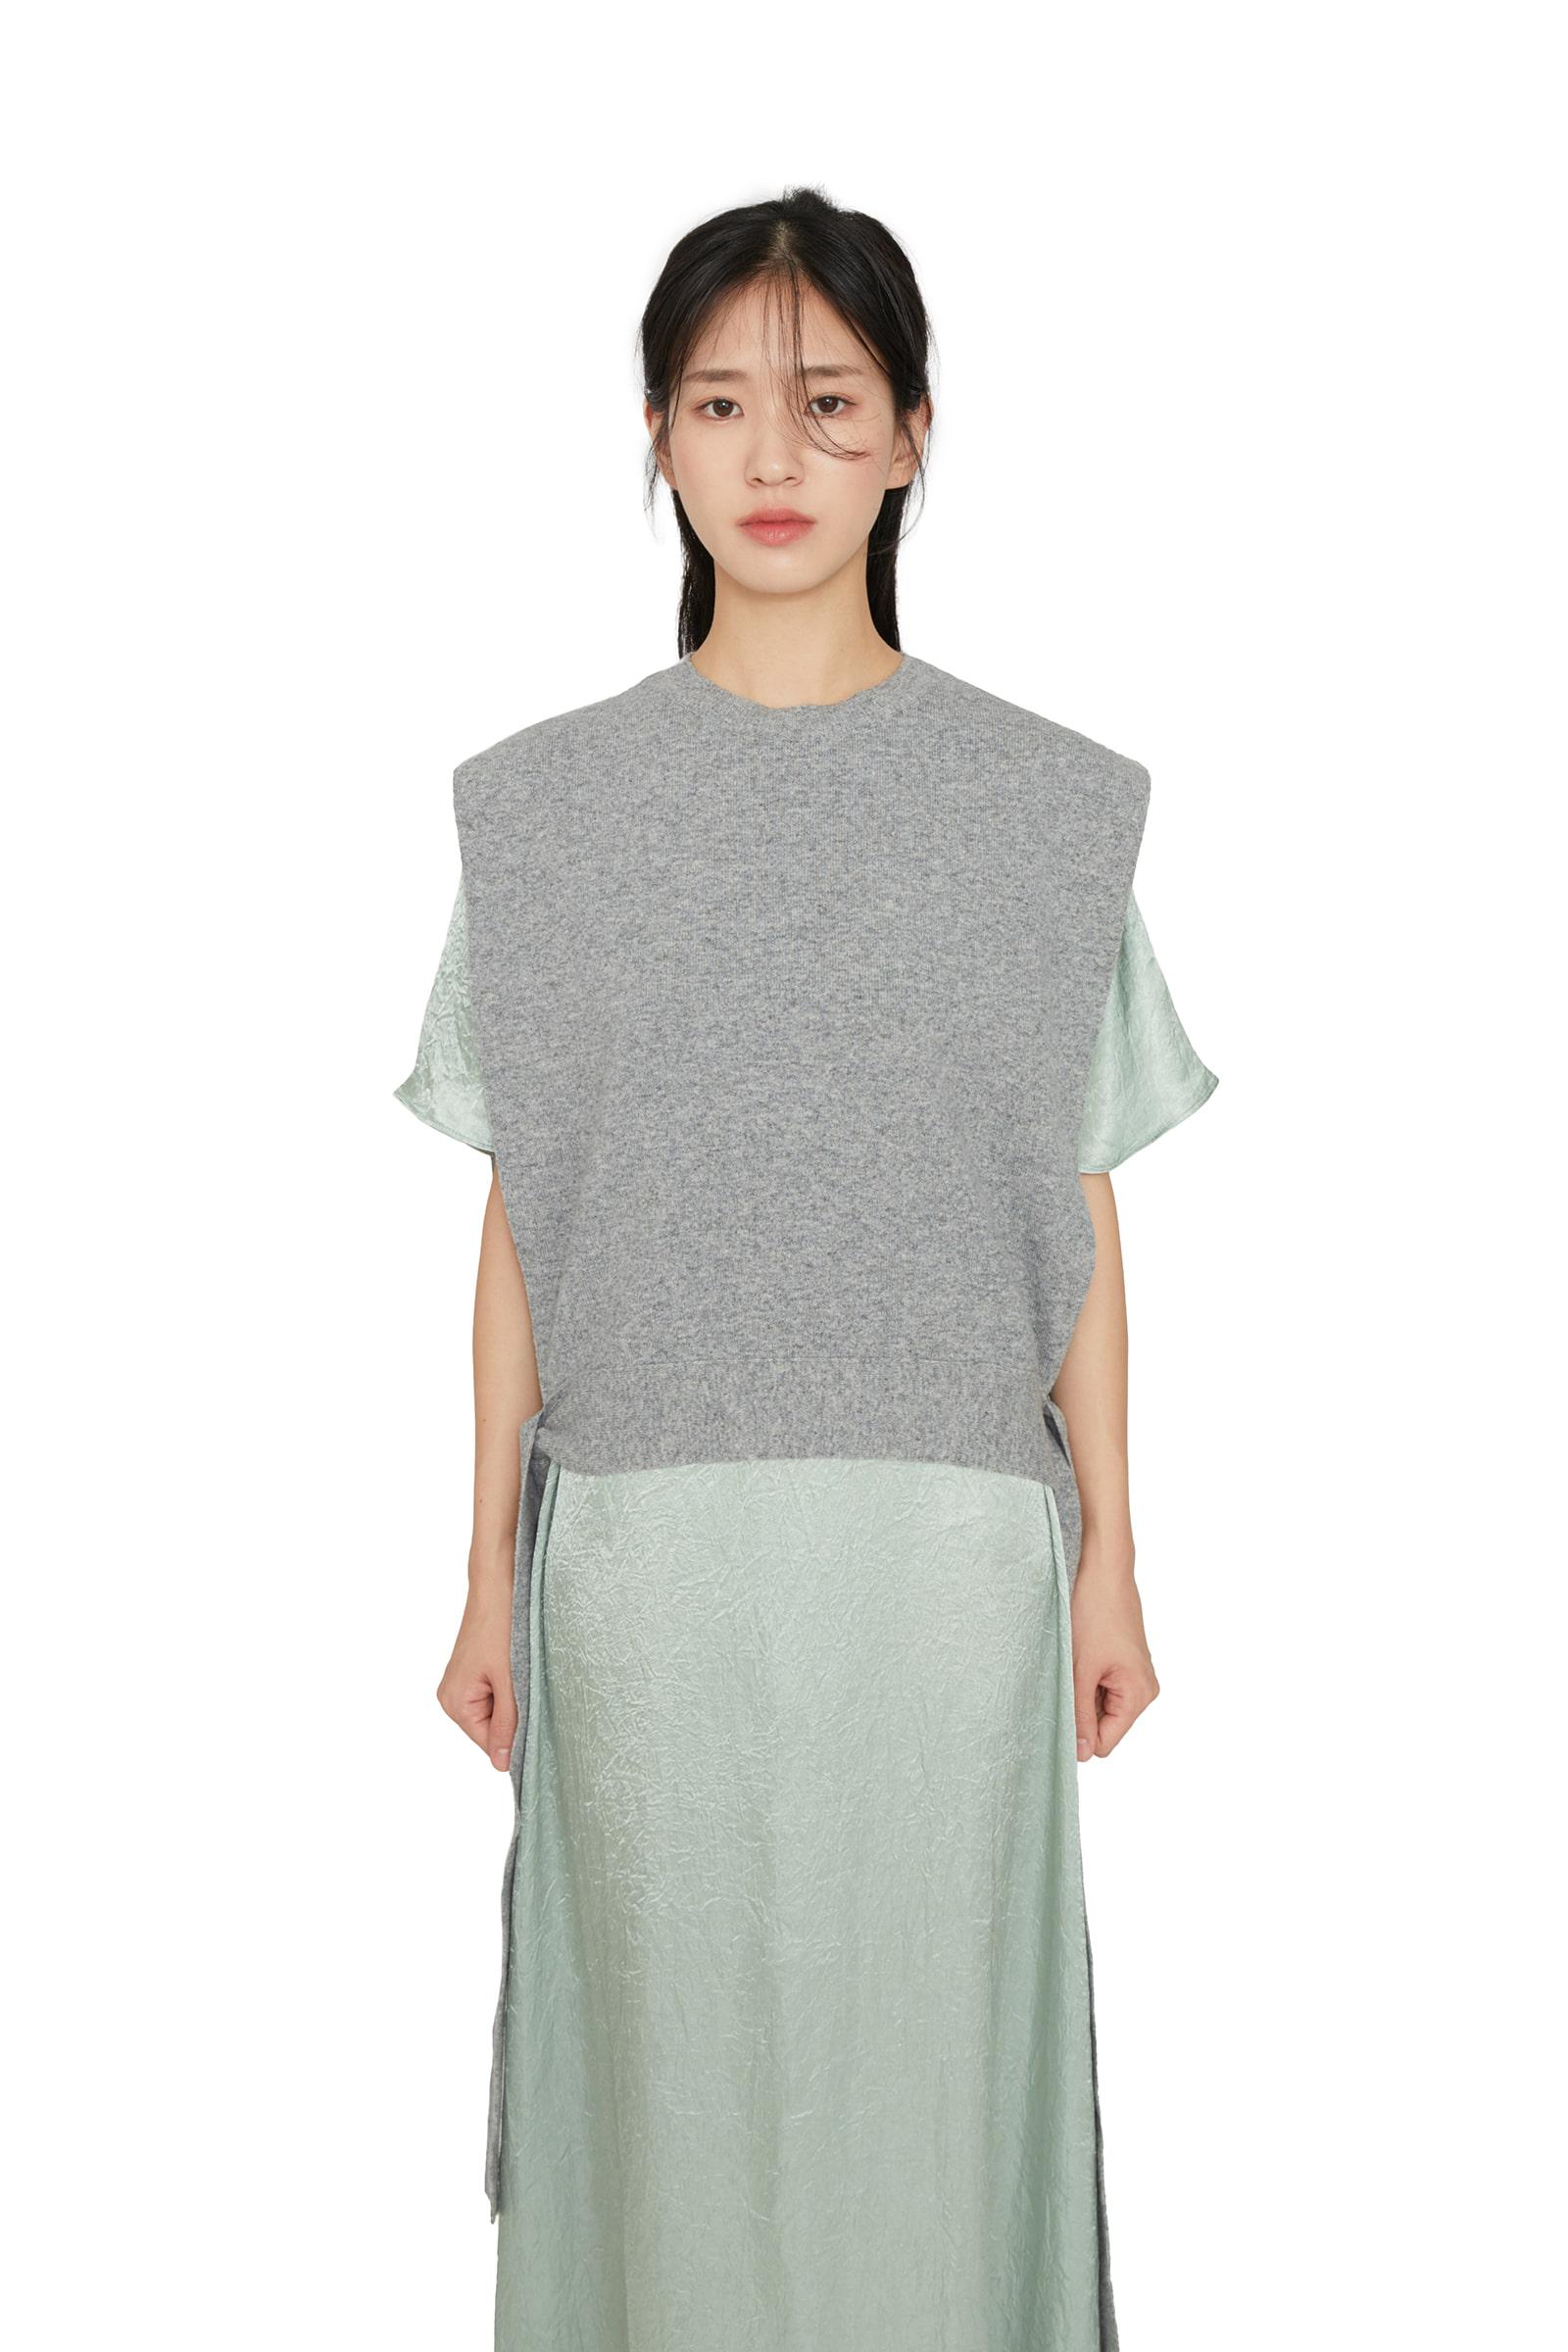 Fuzzy wool strap over knit vest